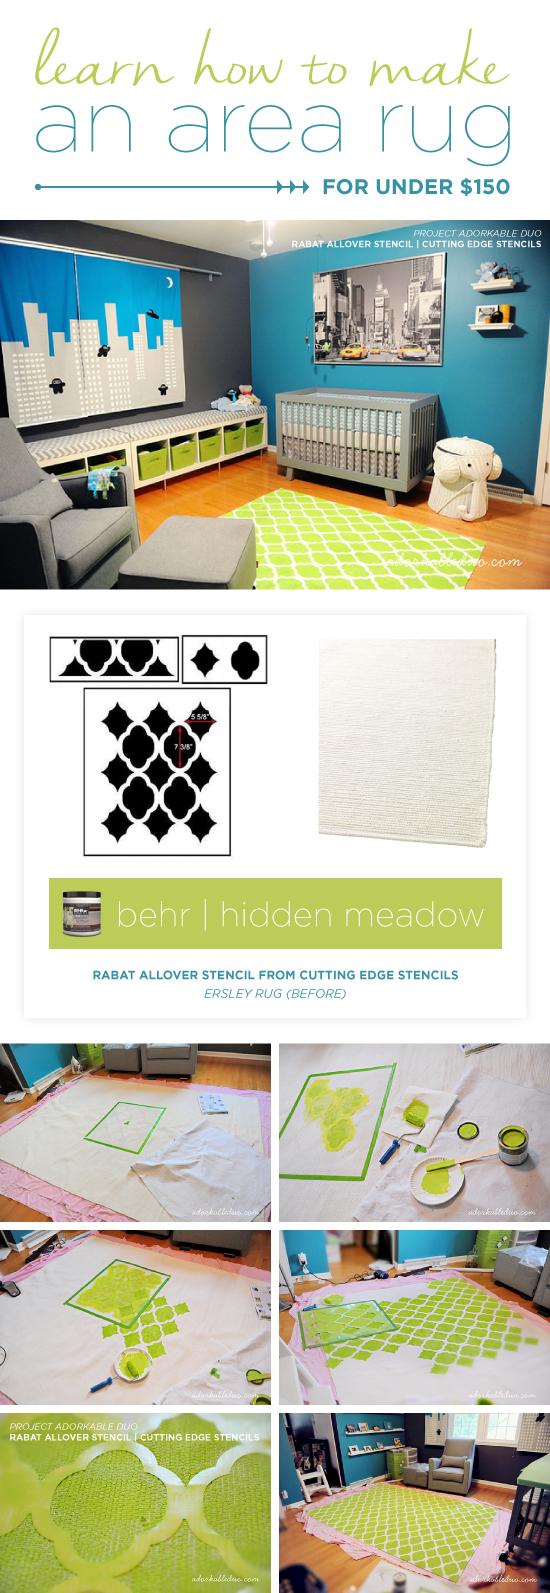 Cutting Edge Stencils shares how to stencil a DIY area rug for a nursery using the Rabat Allover Stencil. http://www.cuttingedgestencils.com/moroccan-stencil-pattern-3.html